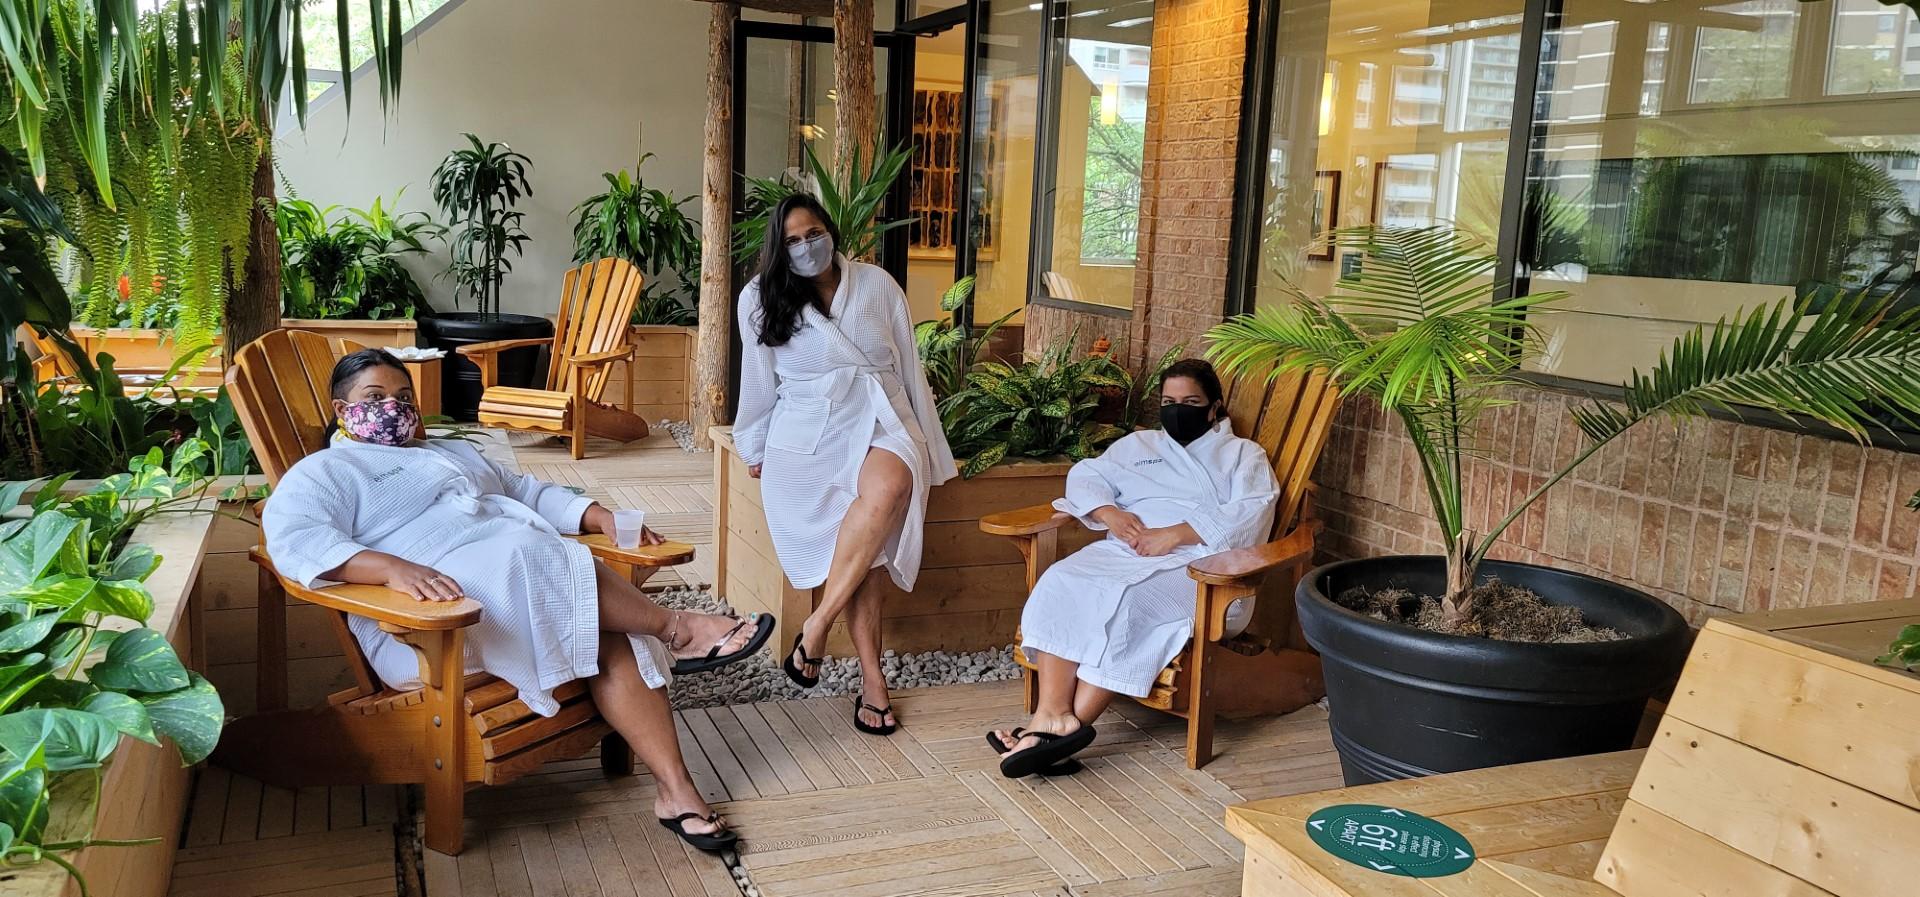 moms in spa robes wearing masks